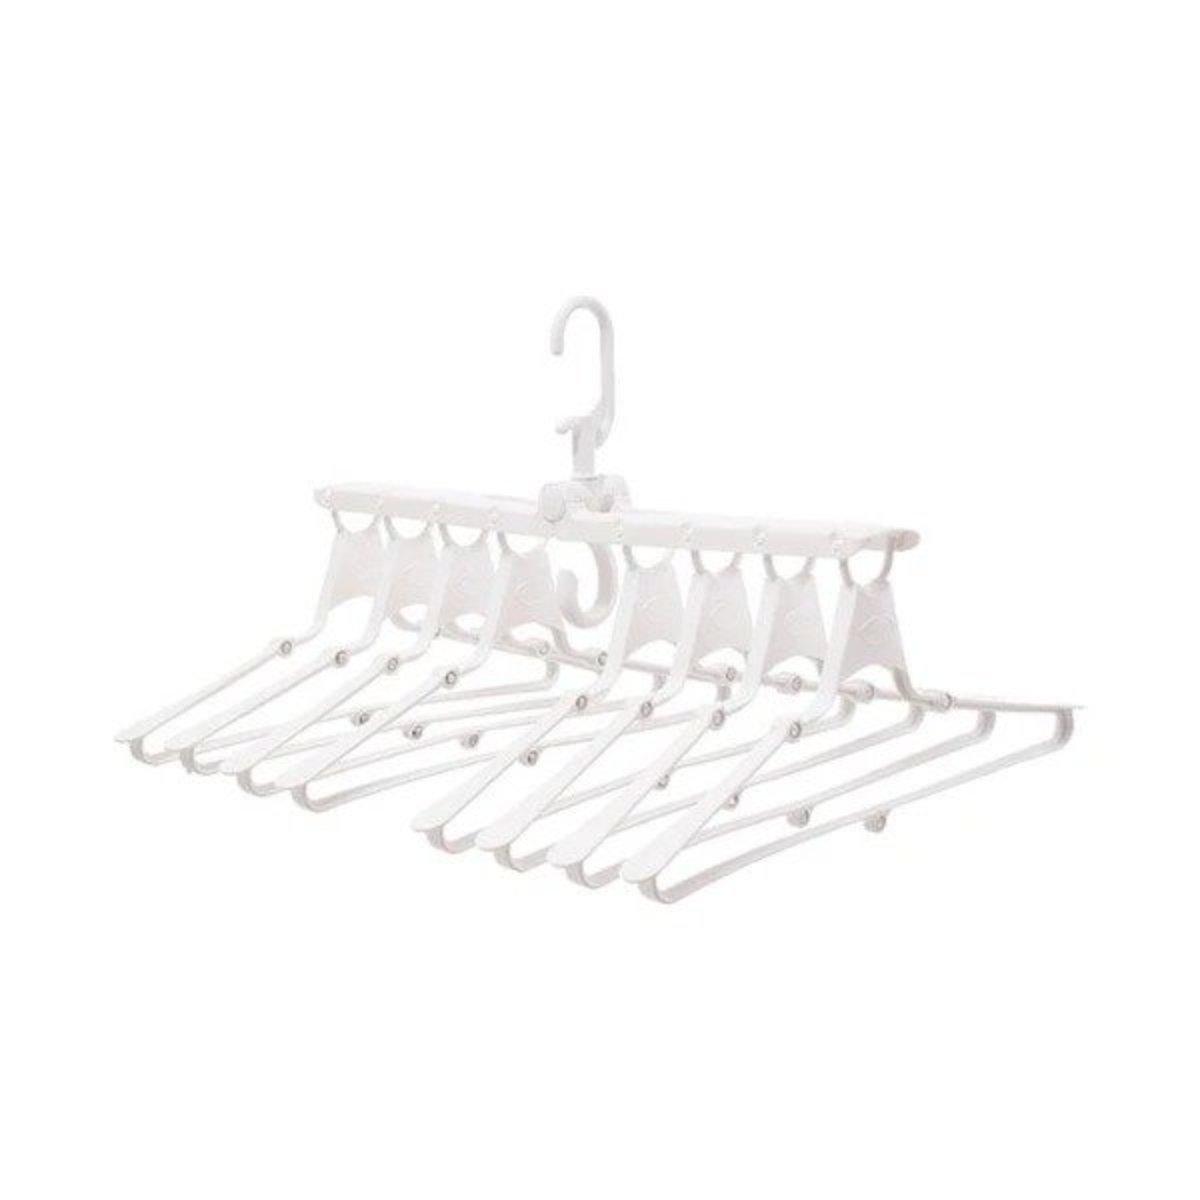 Foldable Large hanger